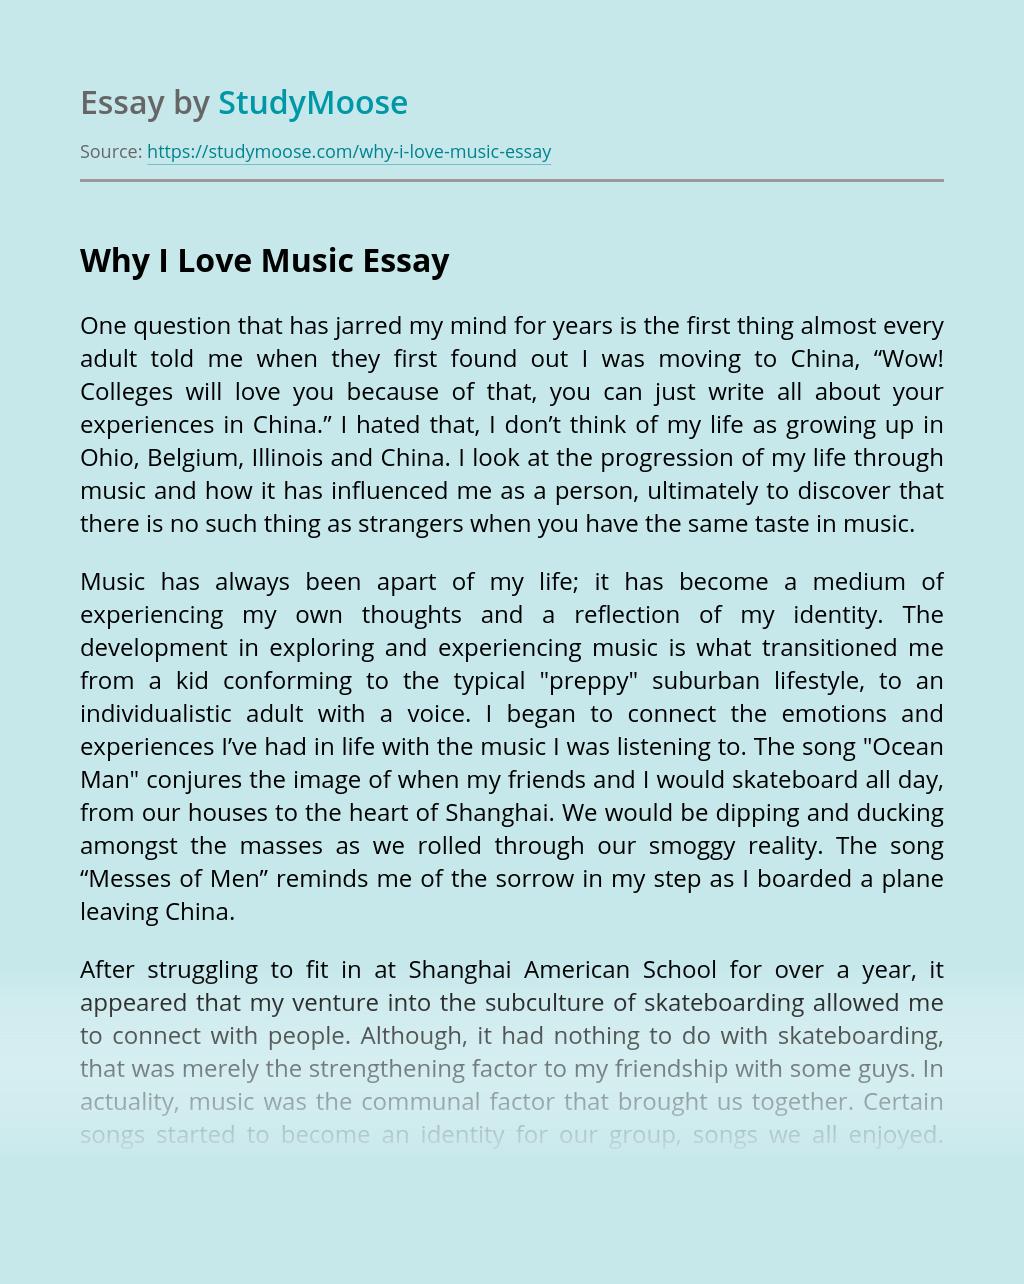 Why I Love Music